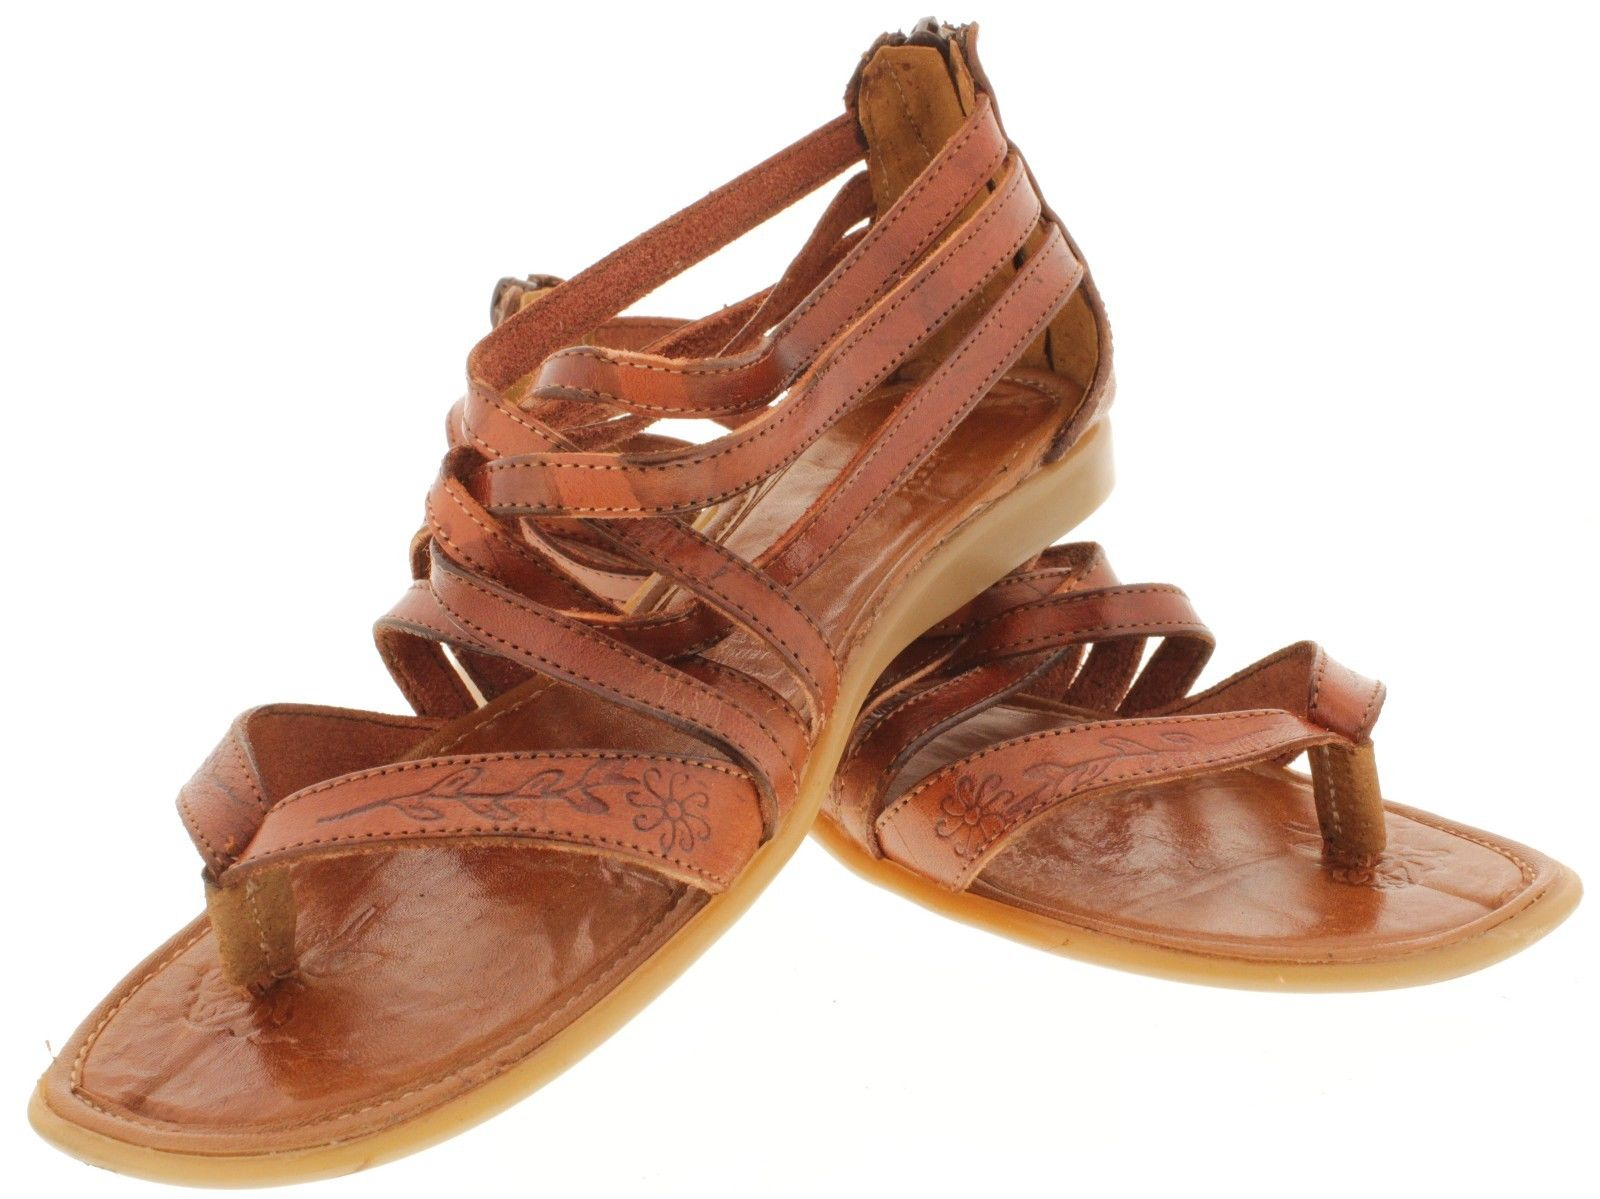 5b9e7cb83da58 Womens Genuine Leather Cognac Boho Sandals Zipper Mexican Huaraches ...